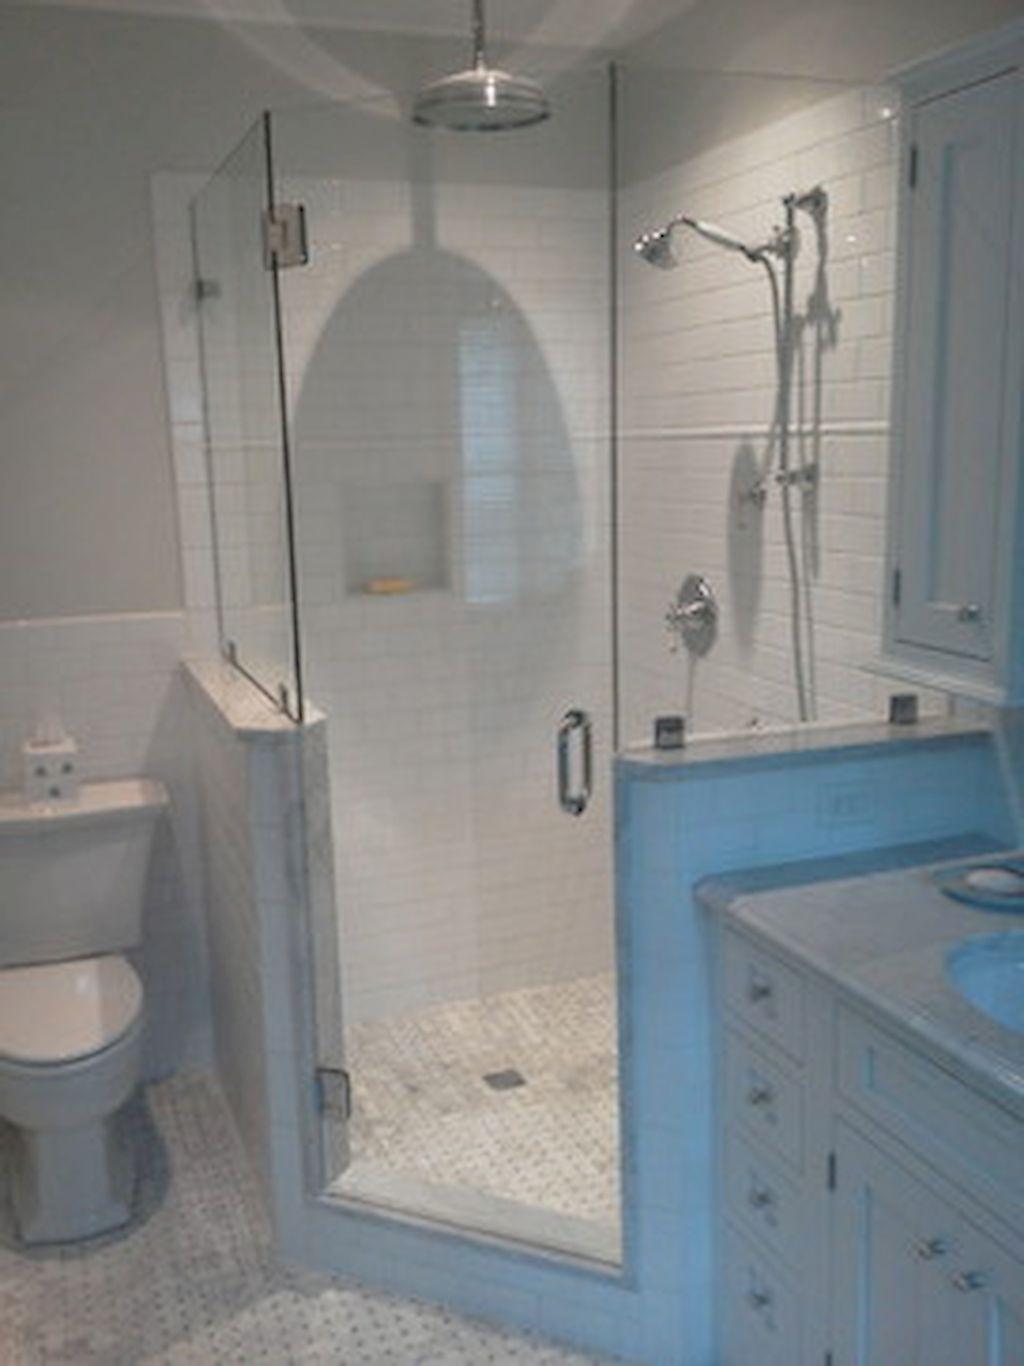 Home Remodeling Hot Springs Ar Corner Showers Bathroom Small Master Ideas Remodel Shower